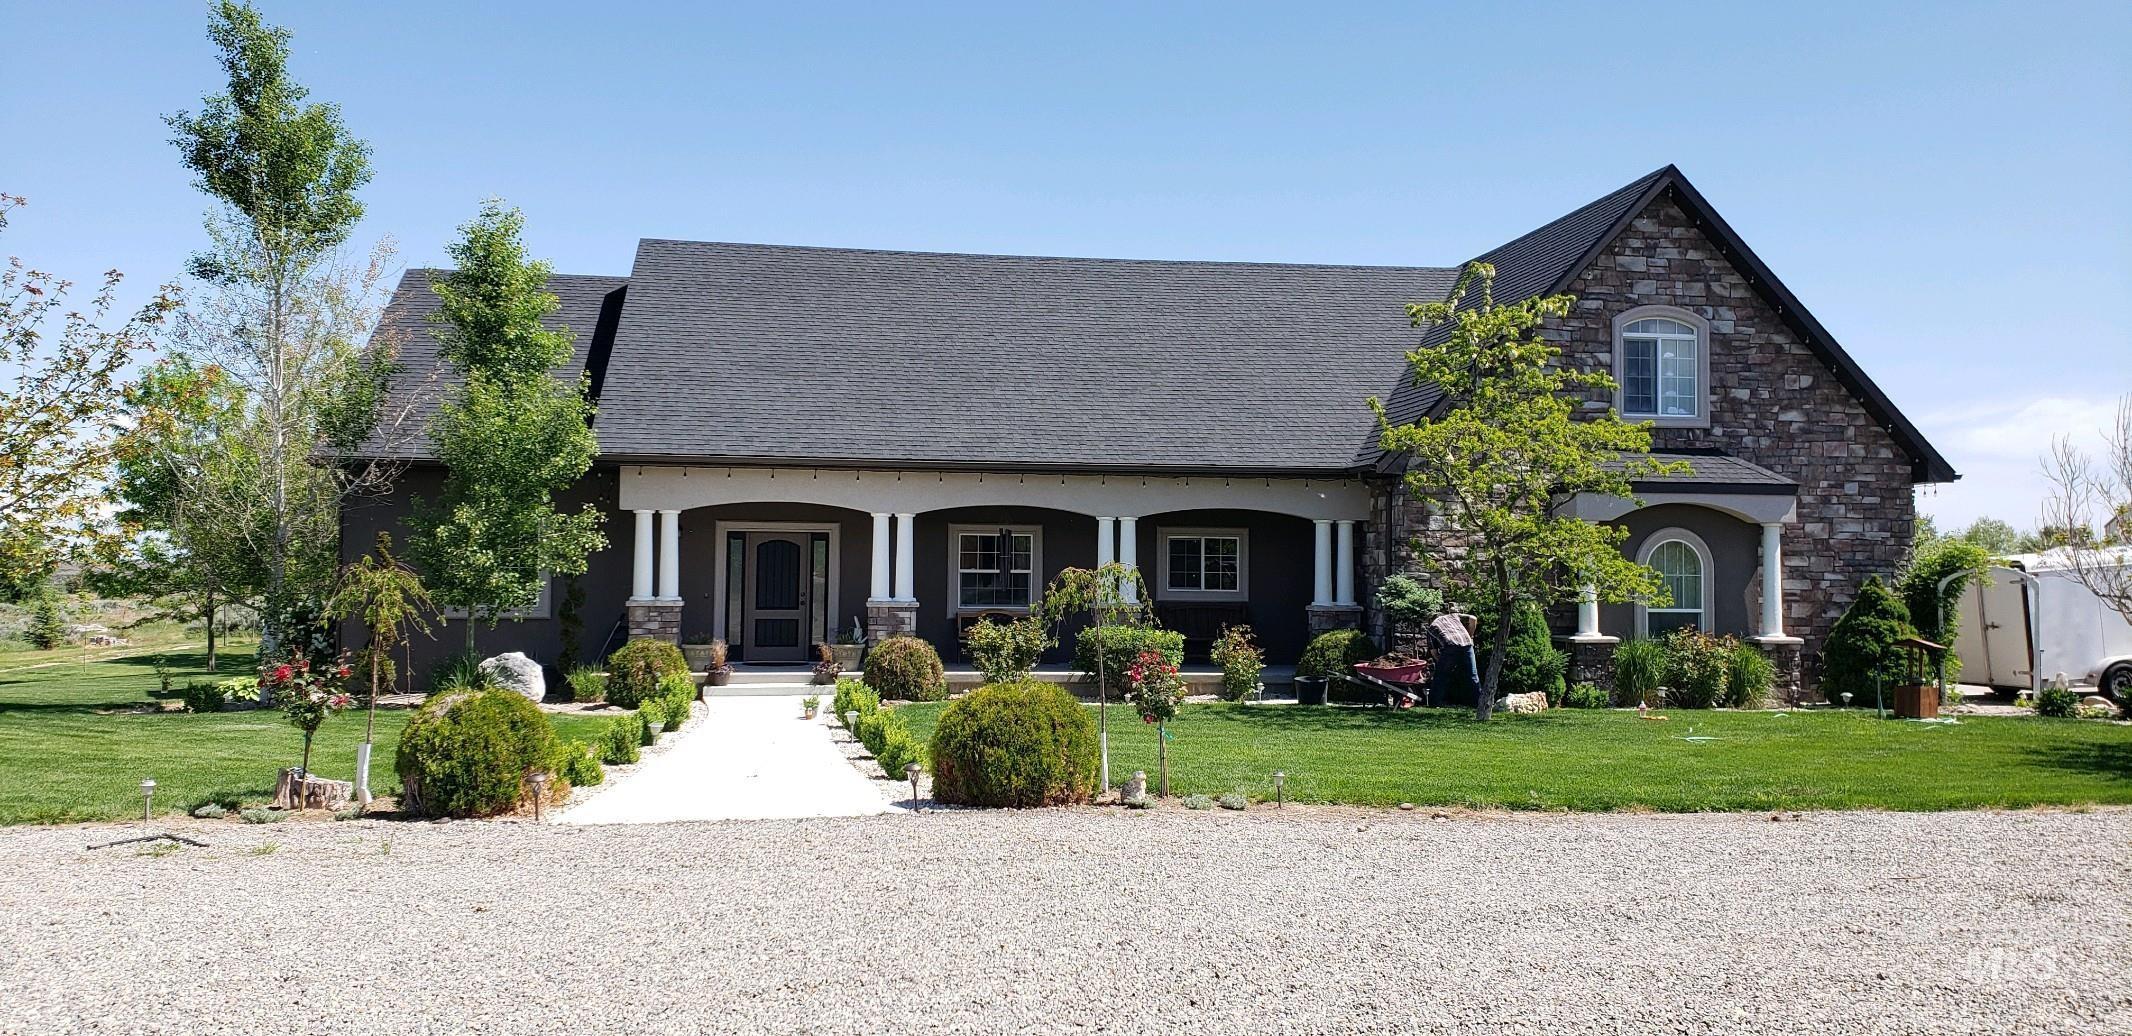 239 Fafnir Dr Property Photo